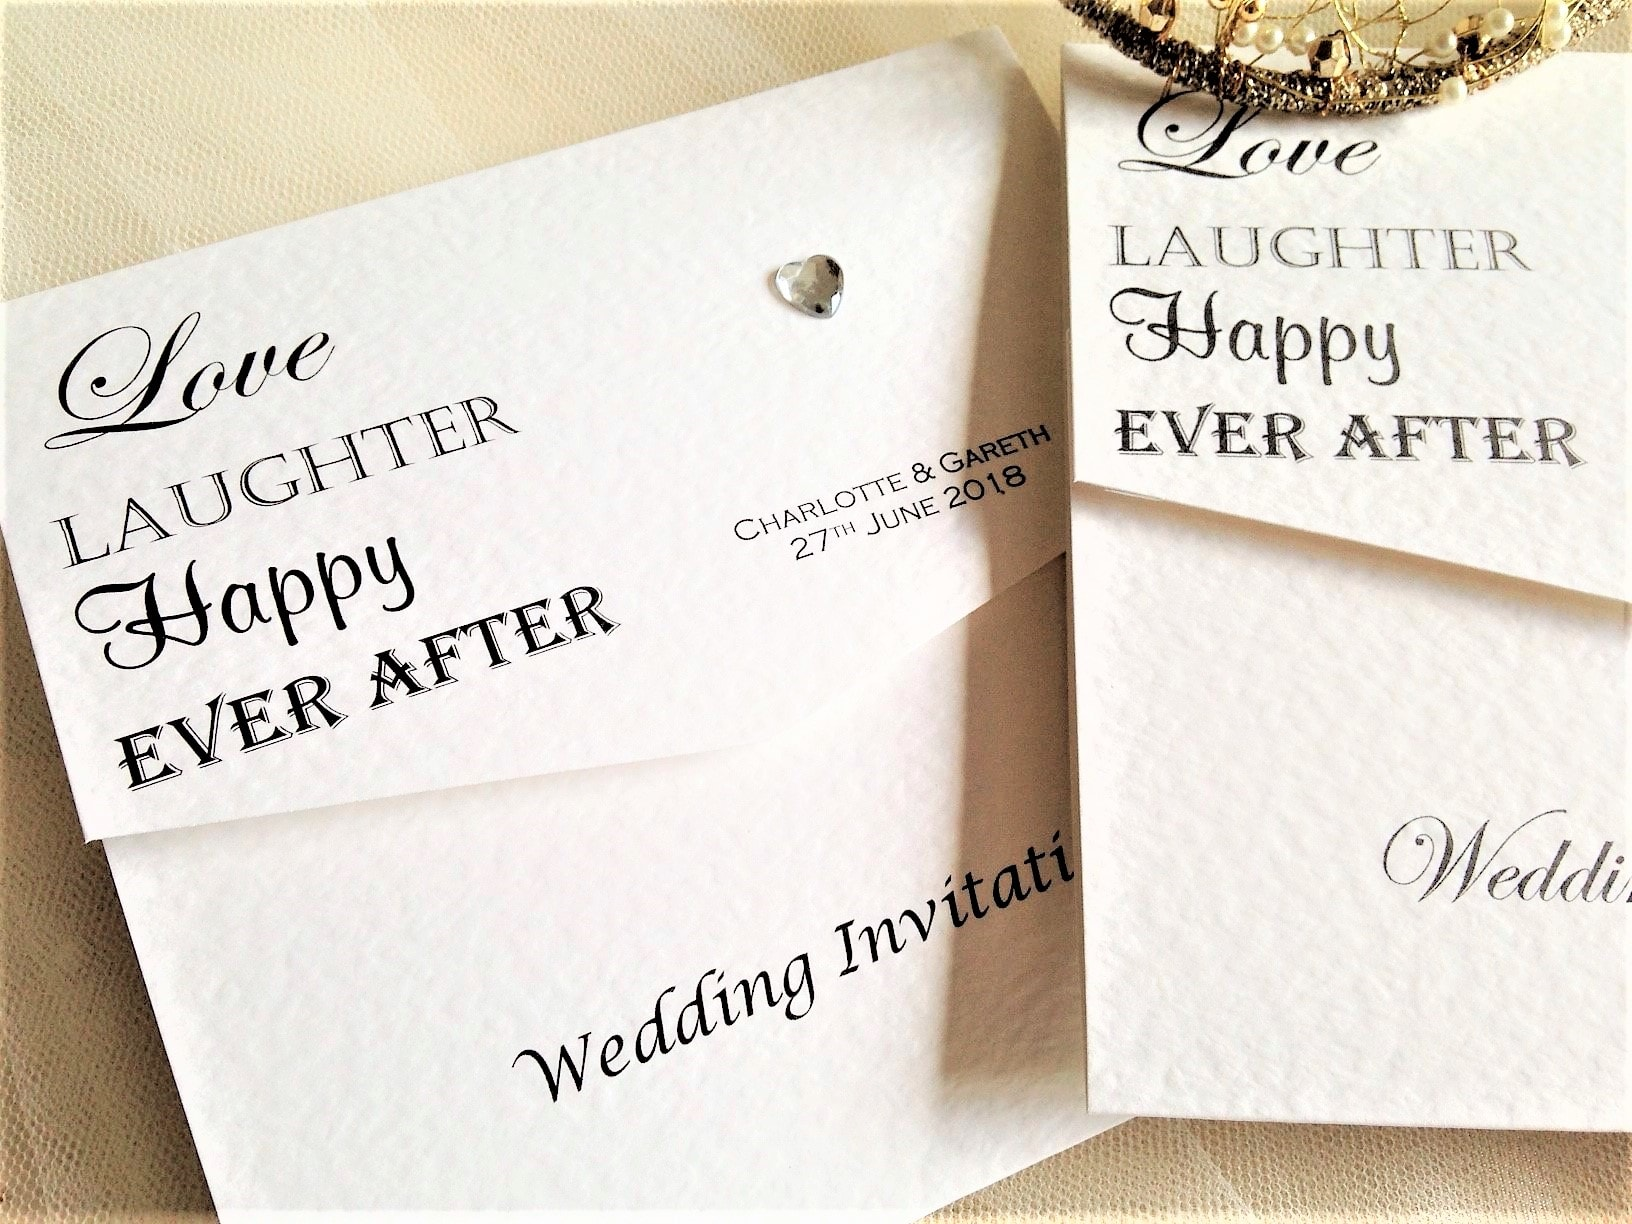 storybook wedding invitation ever after fairytale tri fold wedding